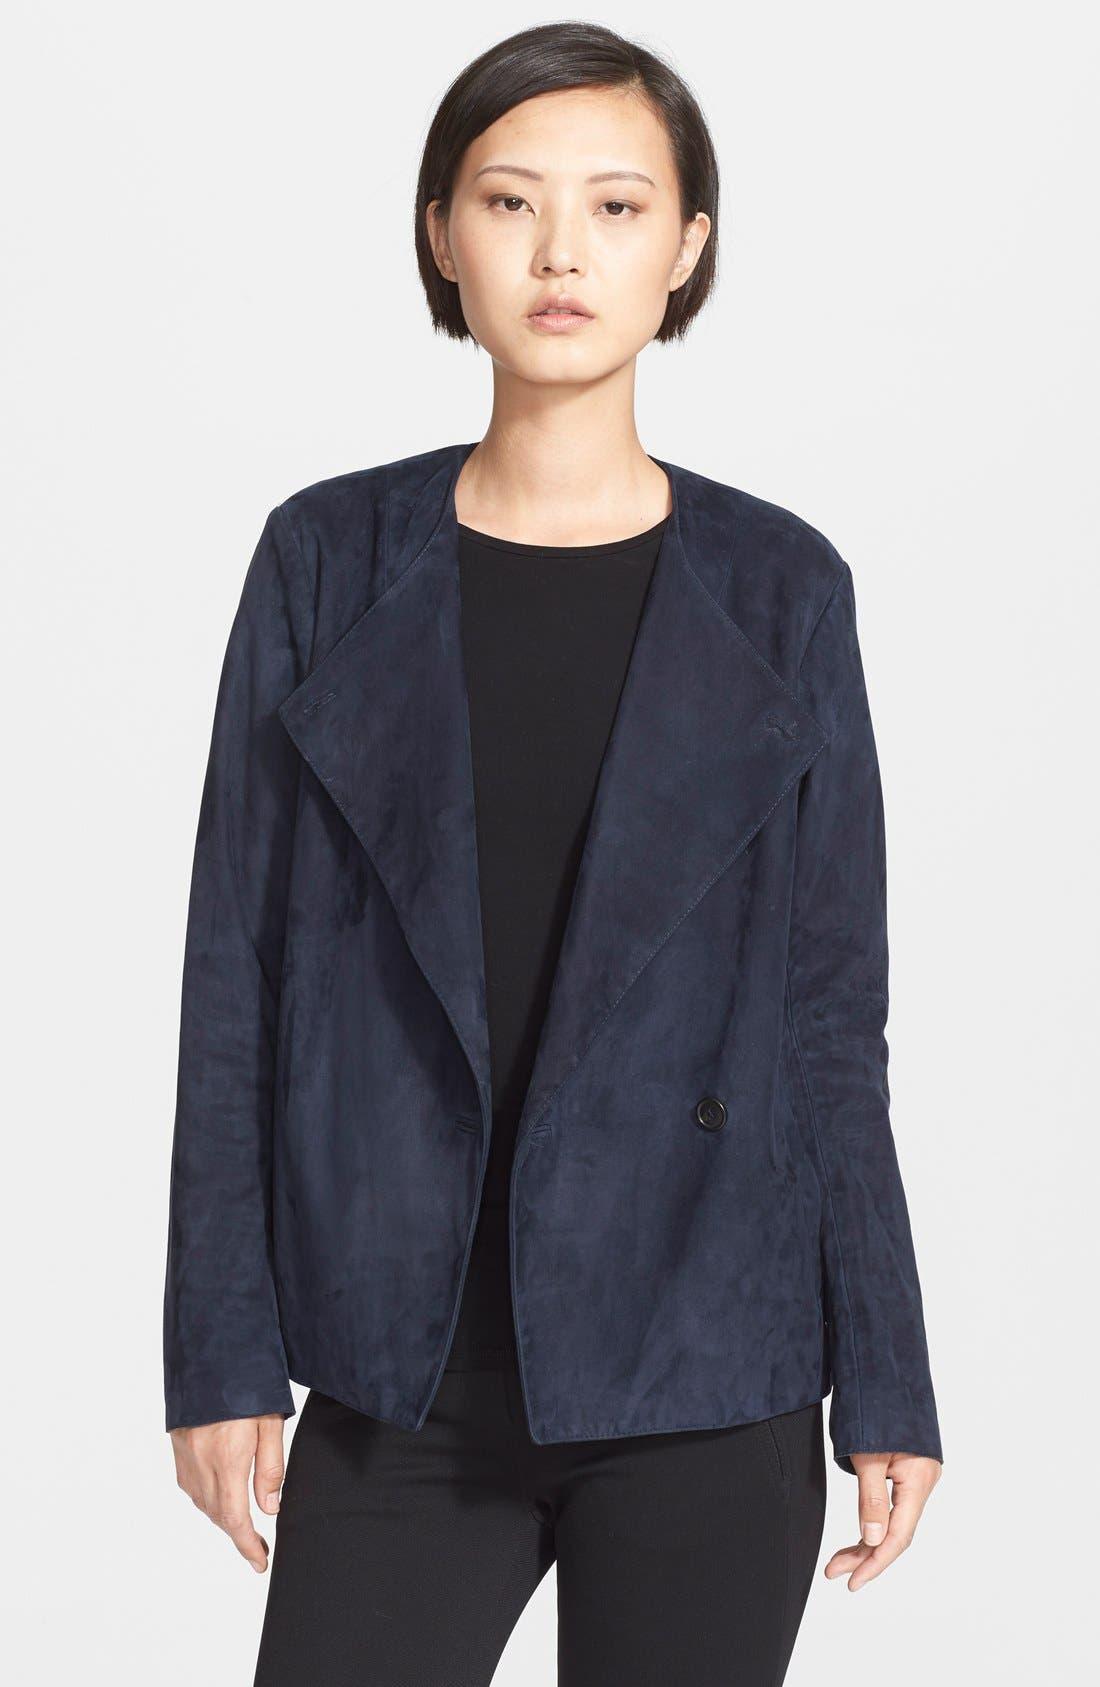 THEORY 'Venizka' Bonded Suede Jacket, Main, color, 410